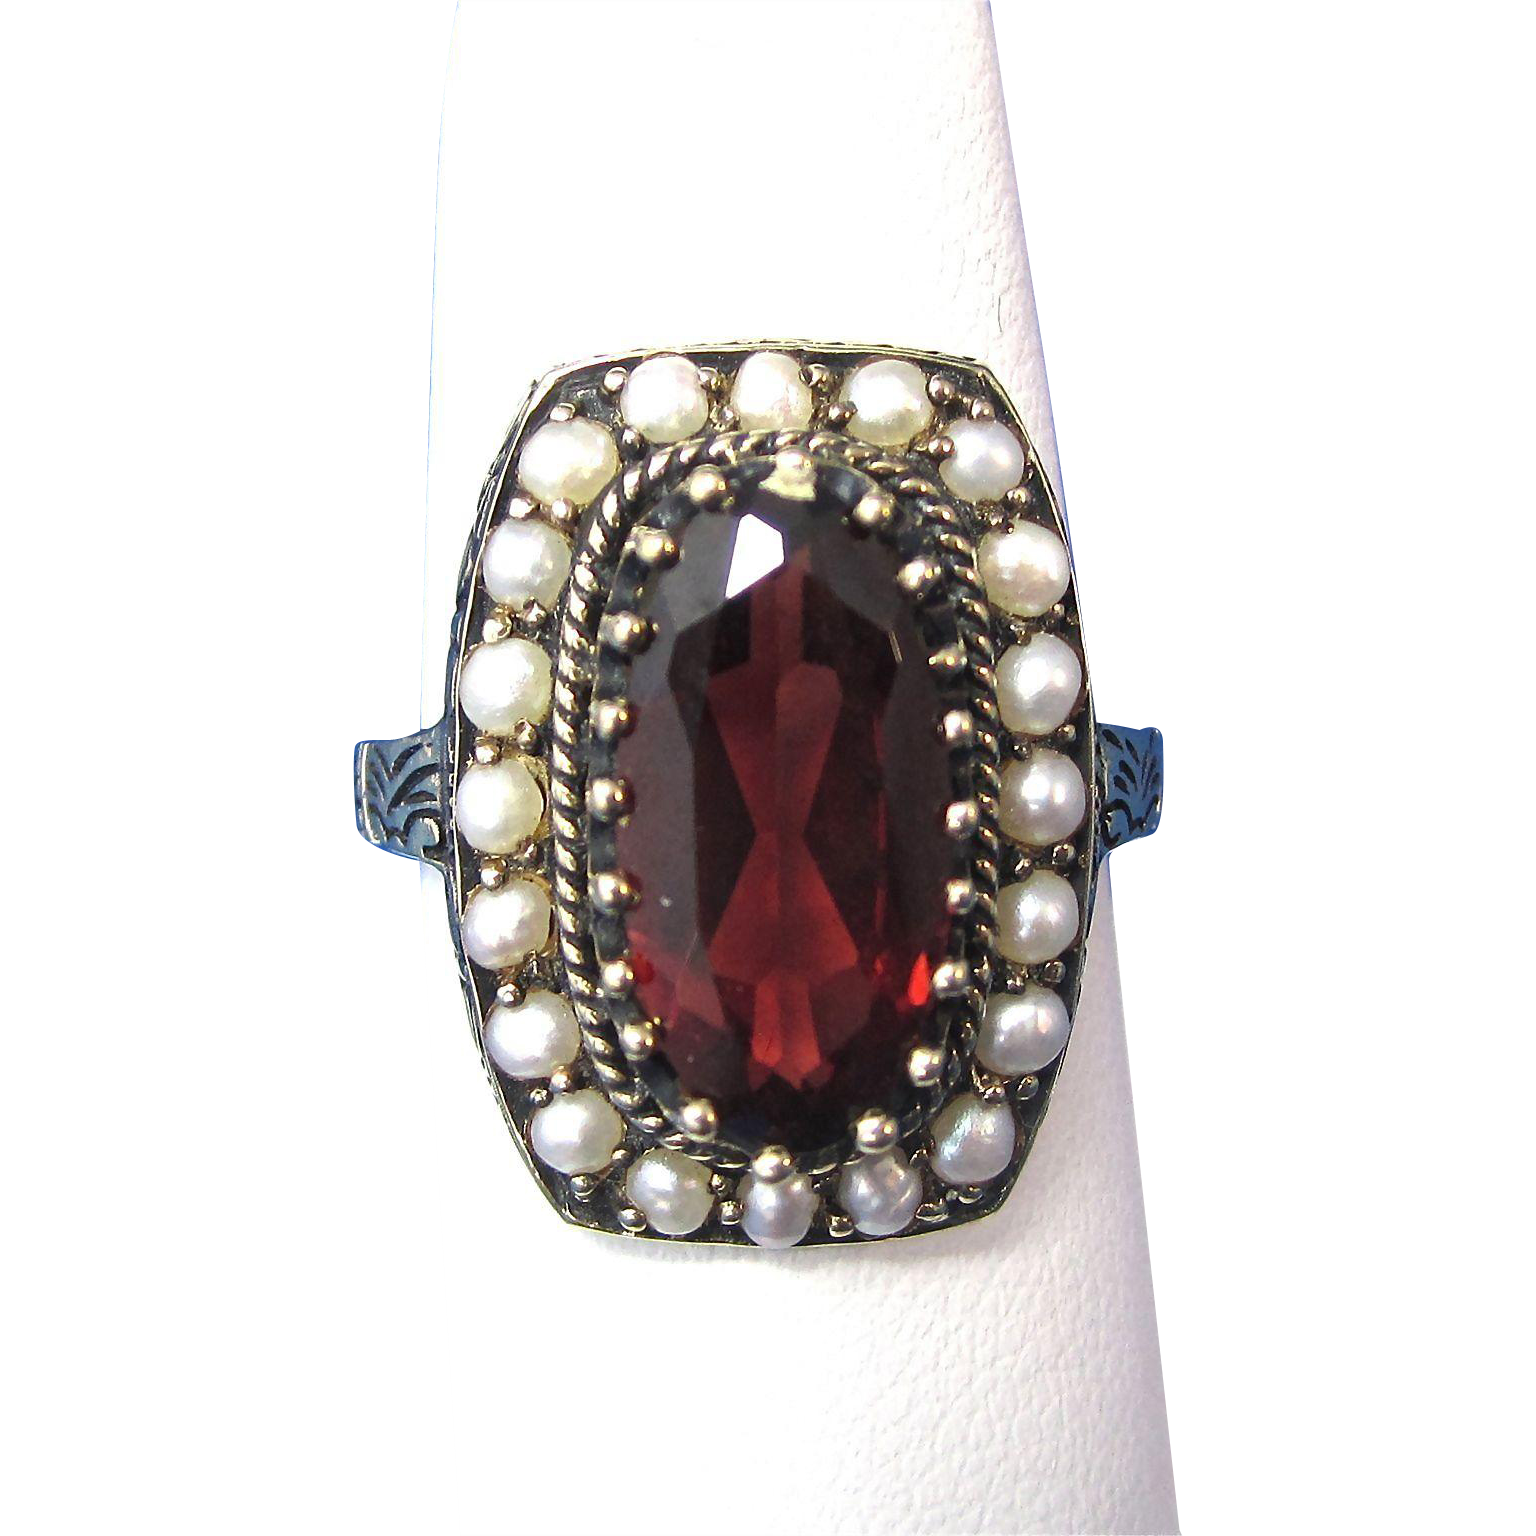 vintage estate 1940's-1950's garnet & seed pearl engagement